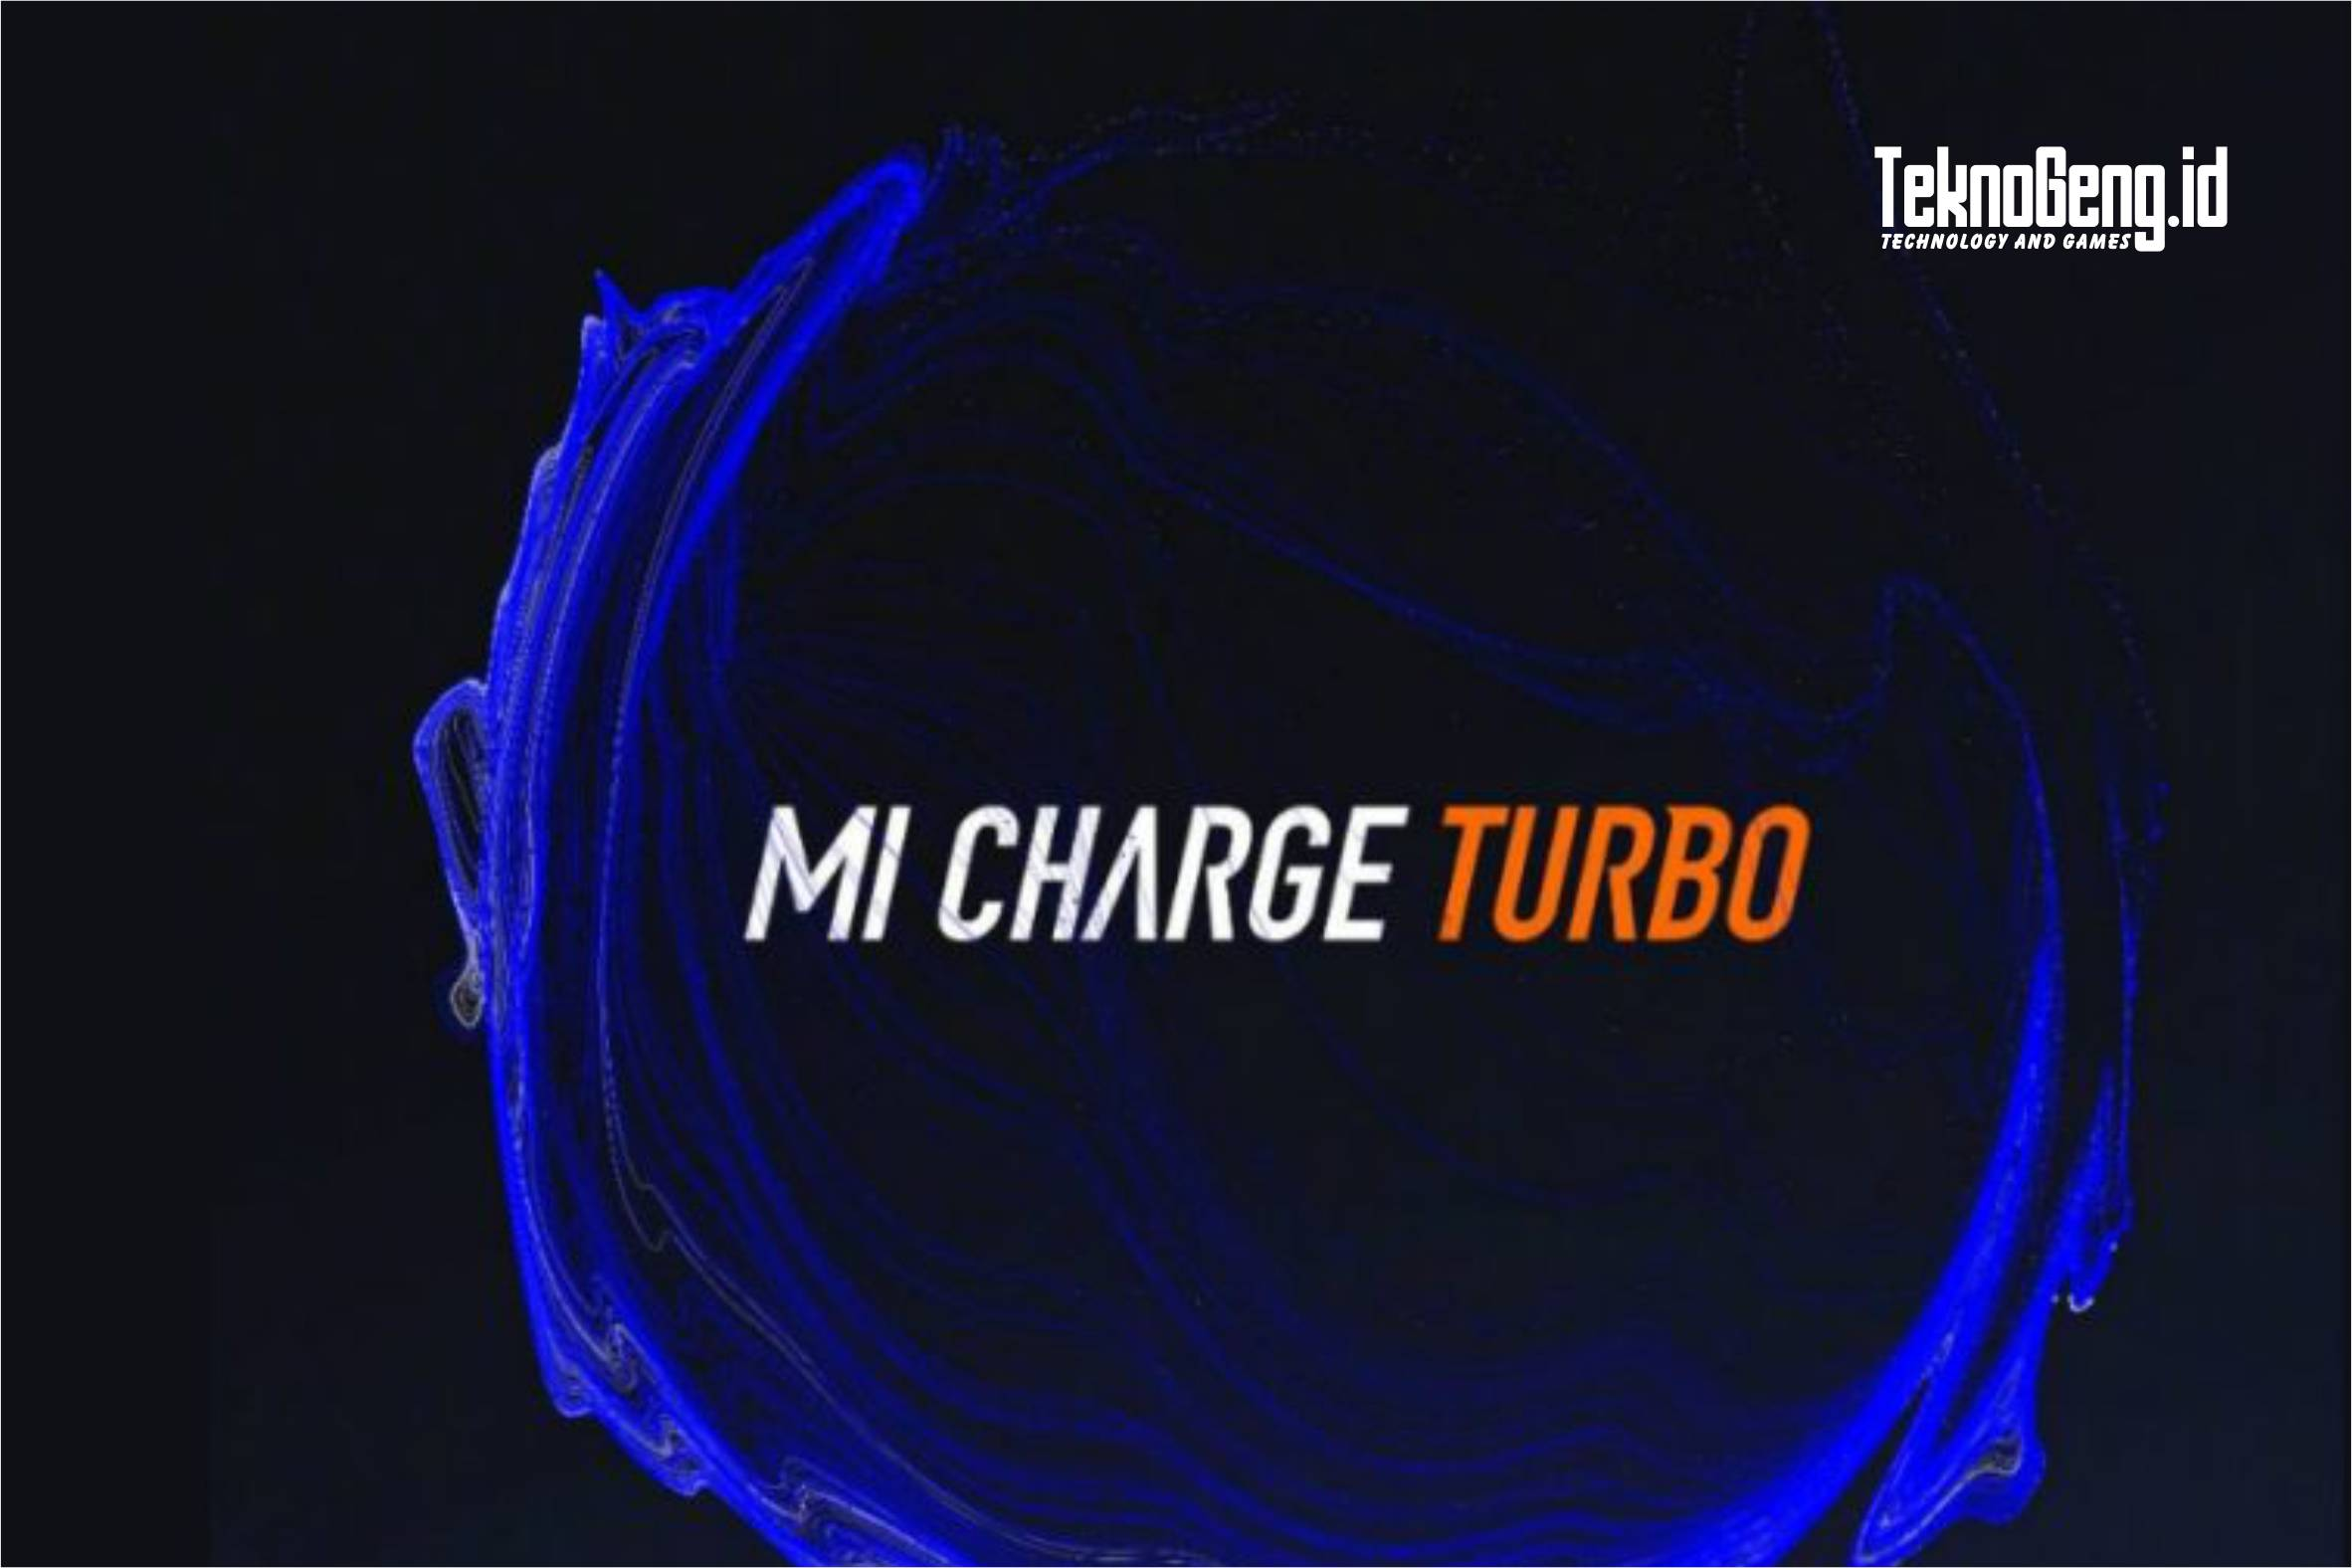 Mi Charge Turbo, Teknologi Charging Terbaru dari Xiaomi